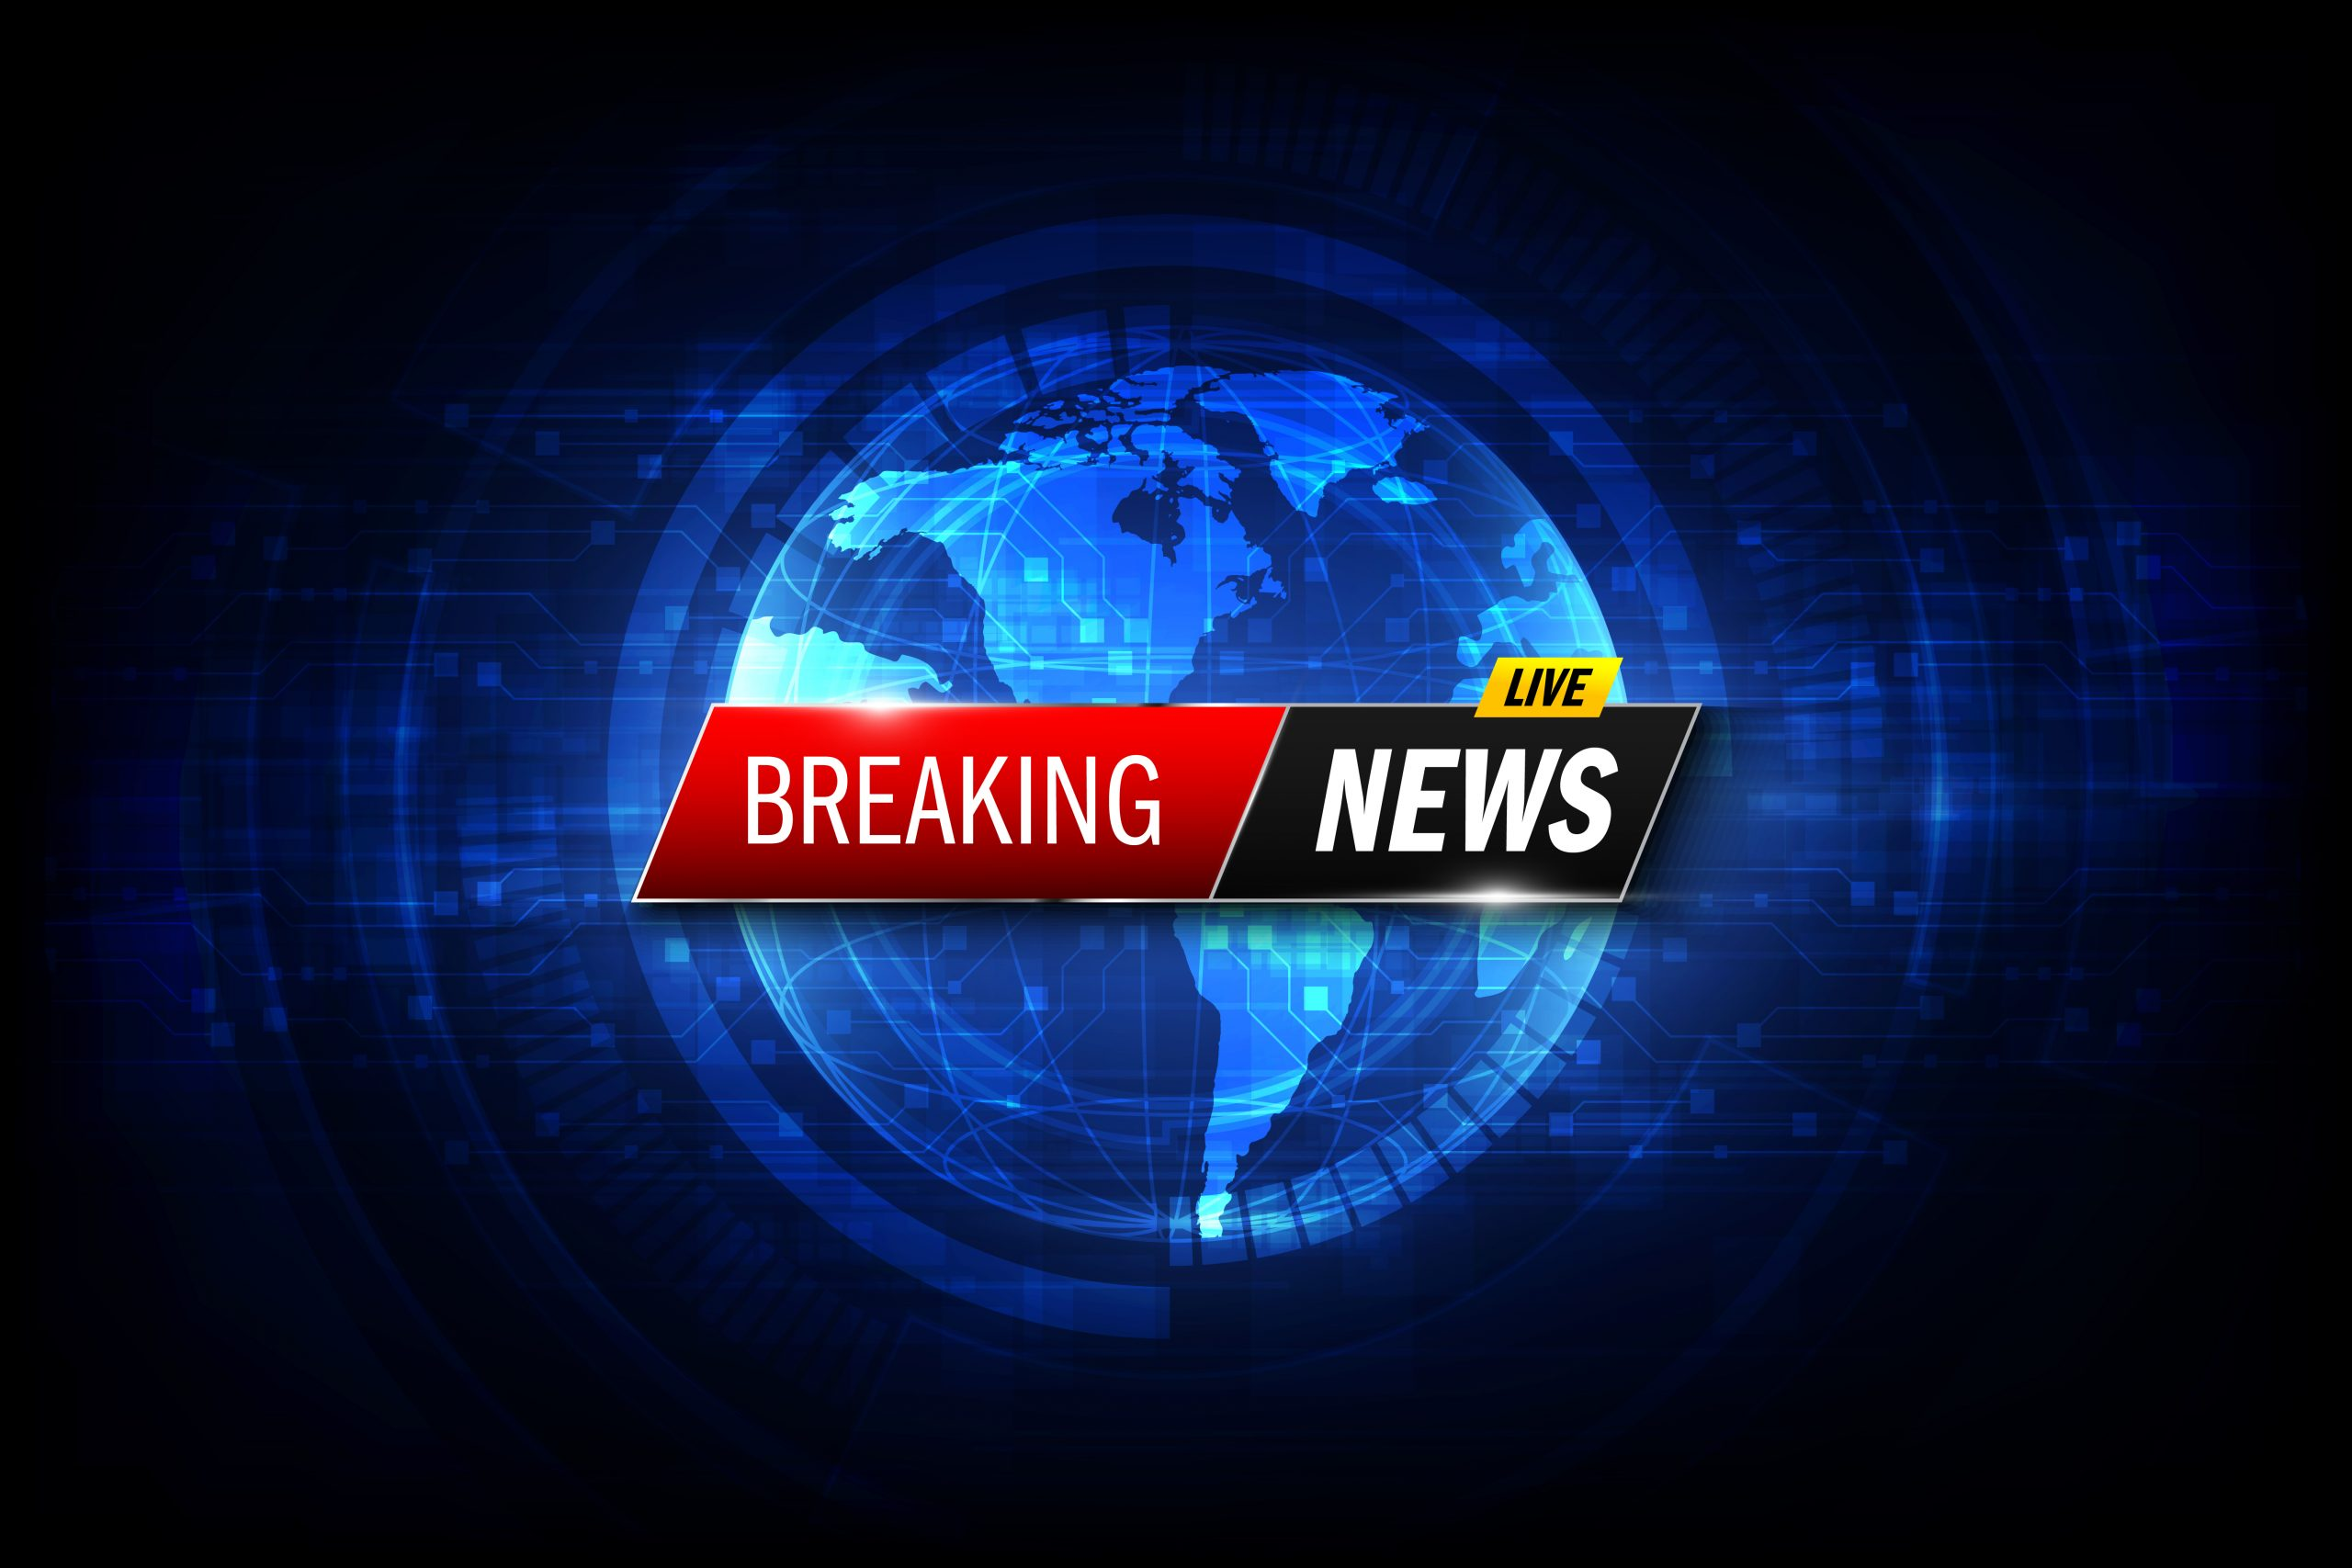 новини-новости-tvnova